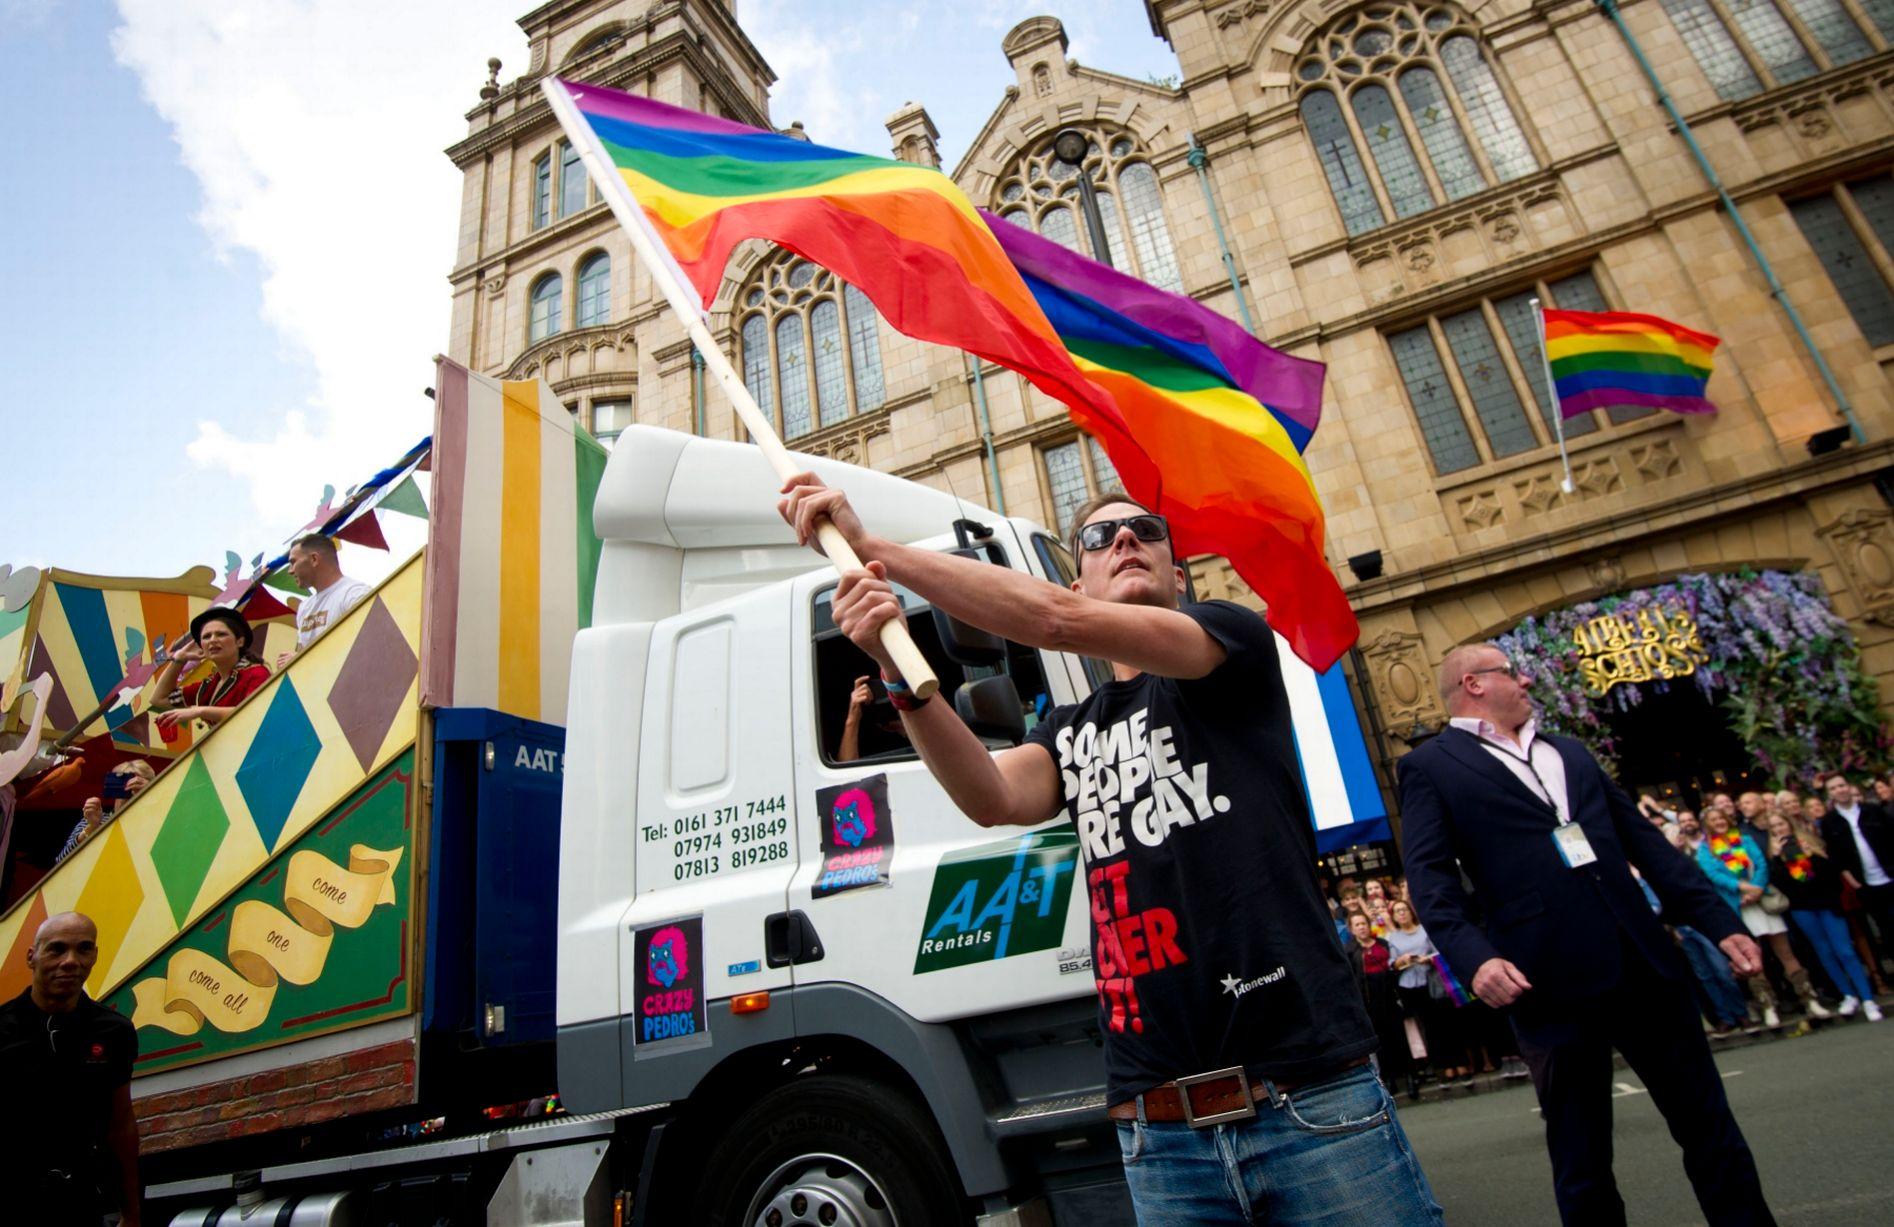 manchester pride rainbow flag 2